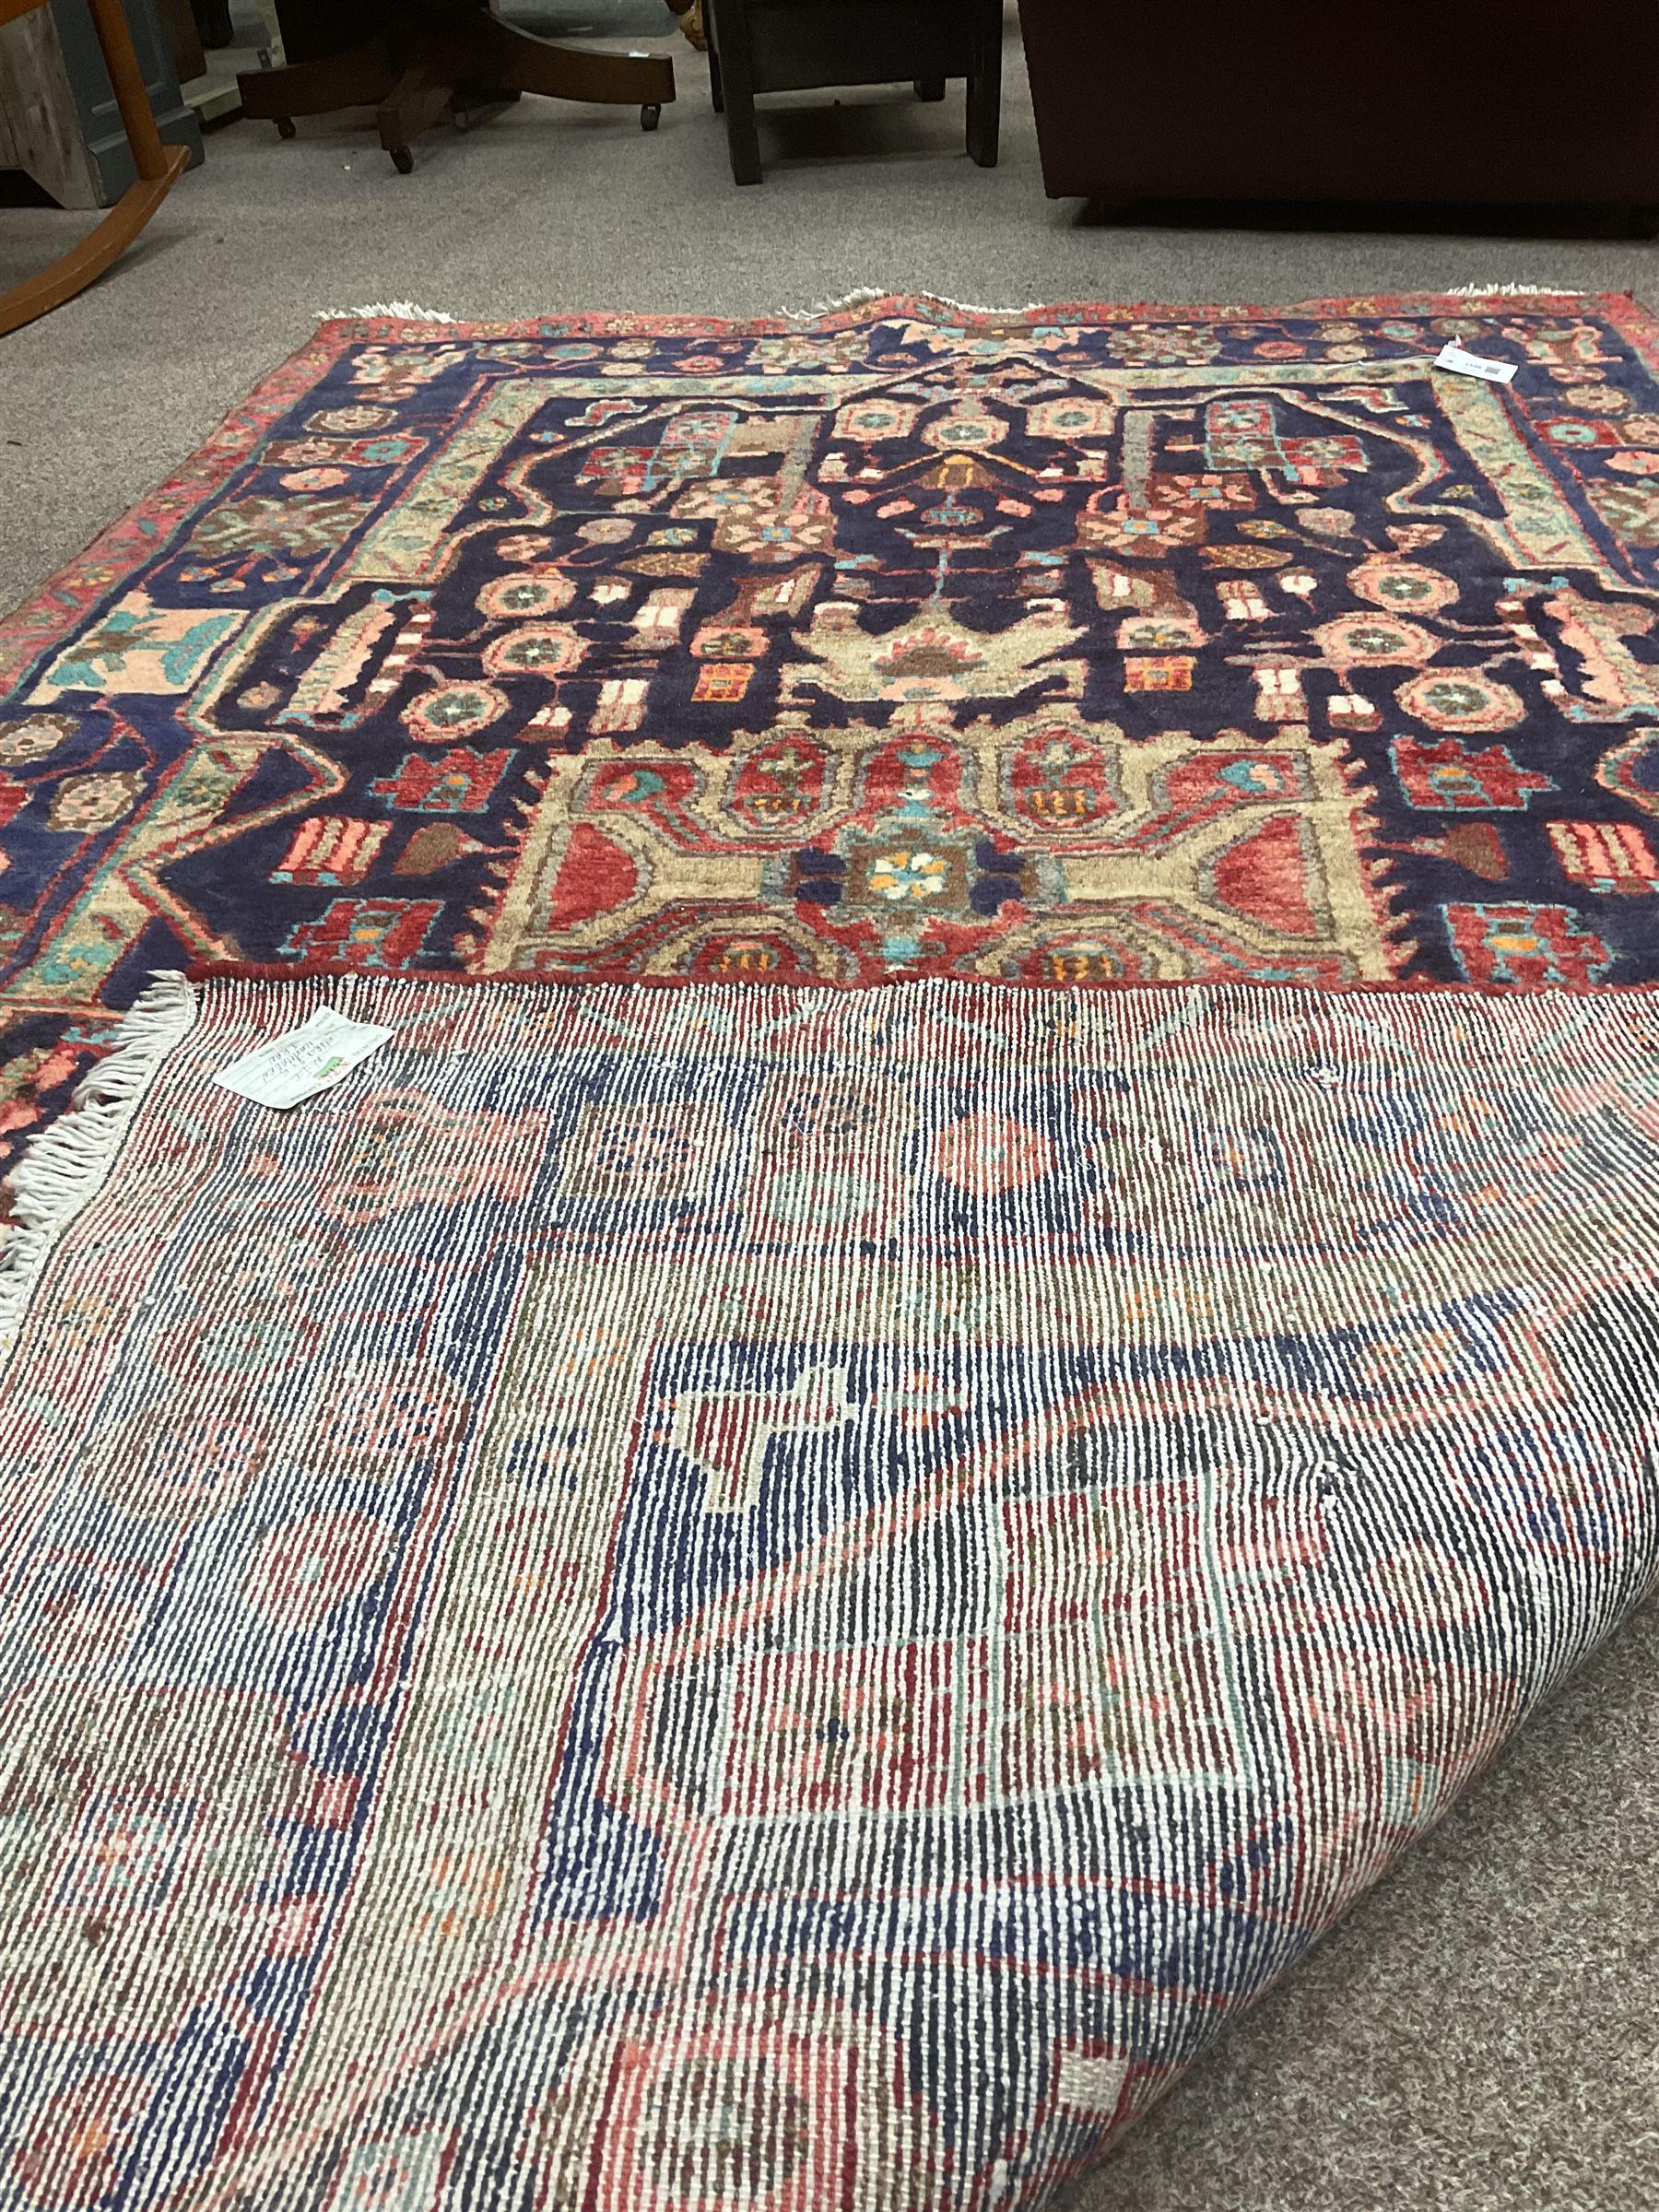 Persian Hamadan blue ground rug - Image 4 of 4